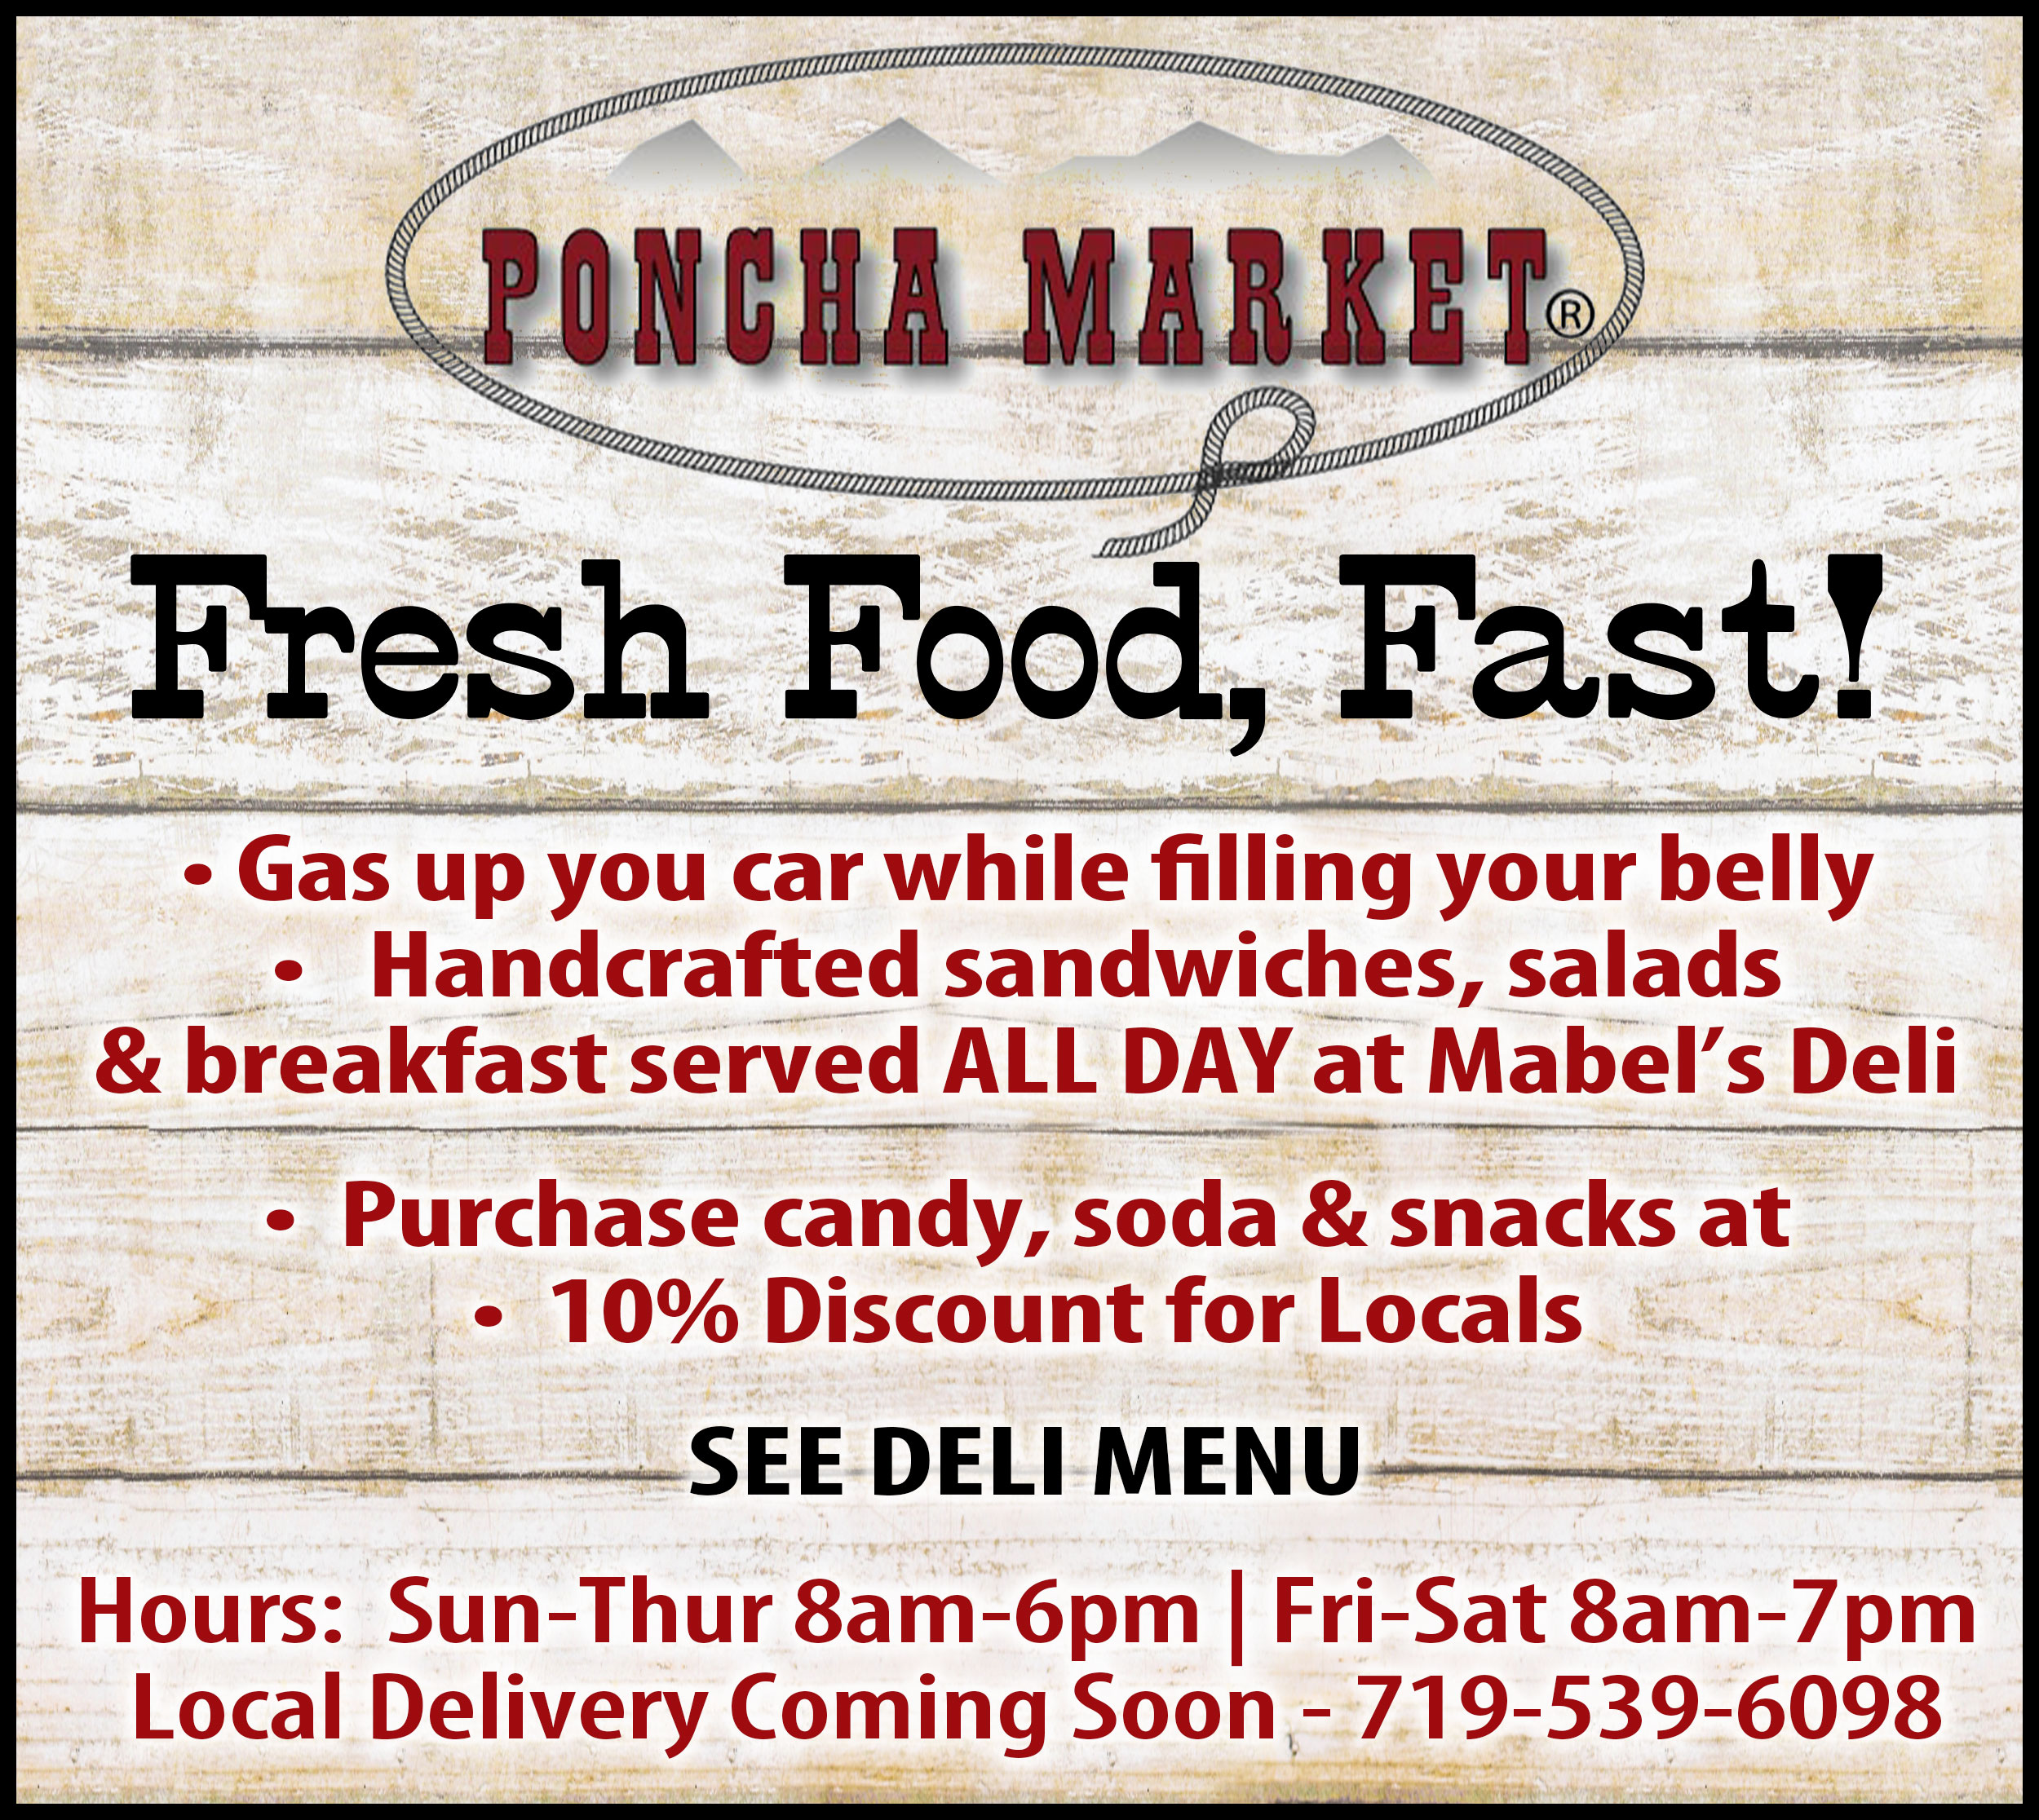 Poncha Market Sidebar